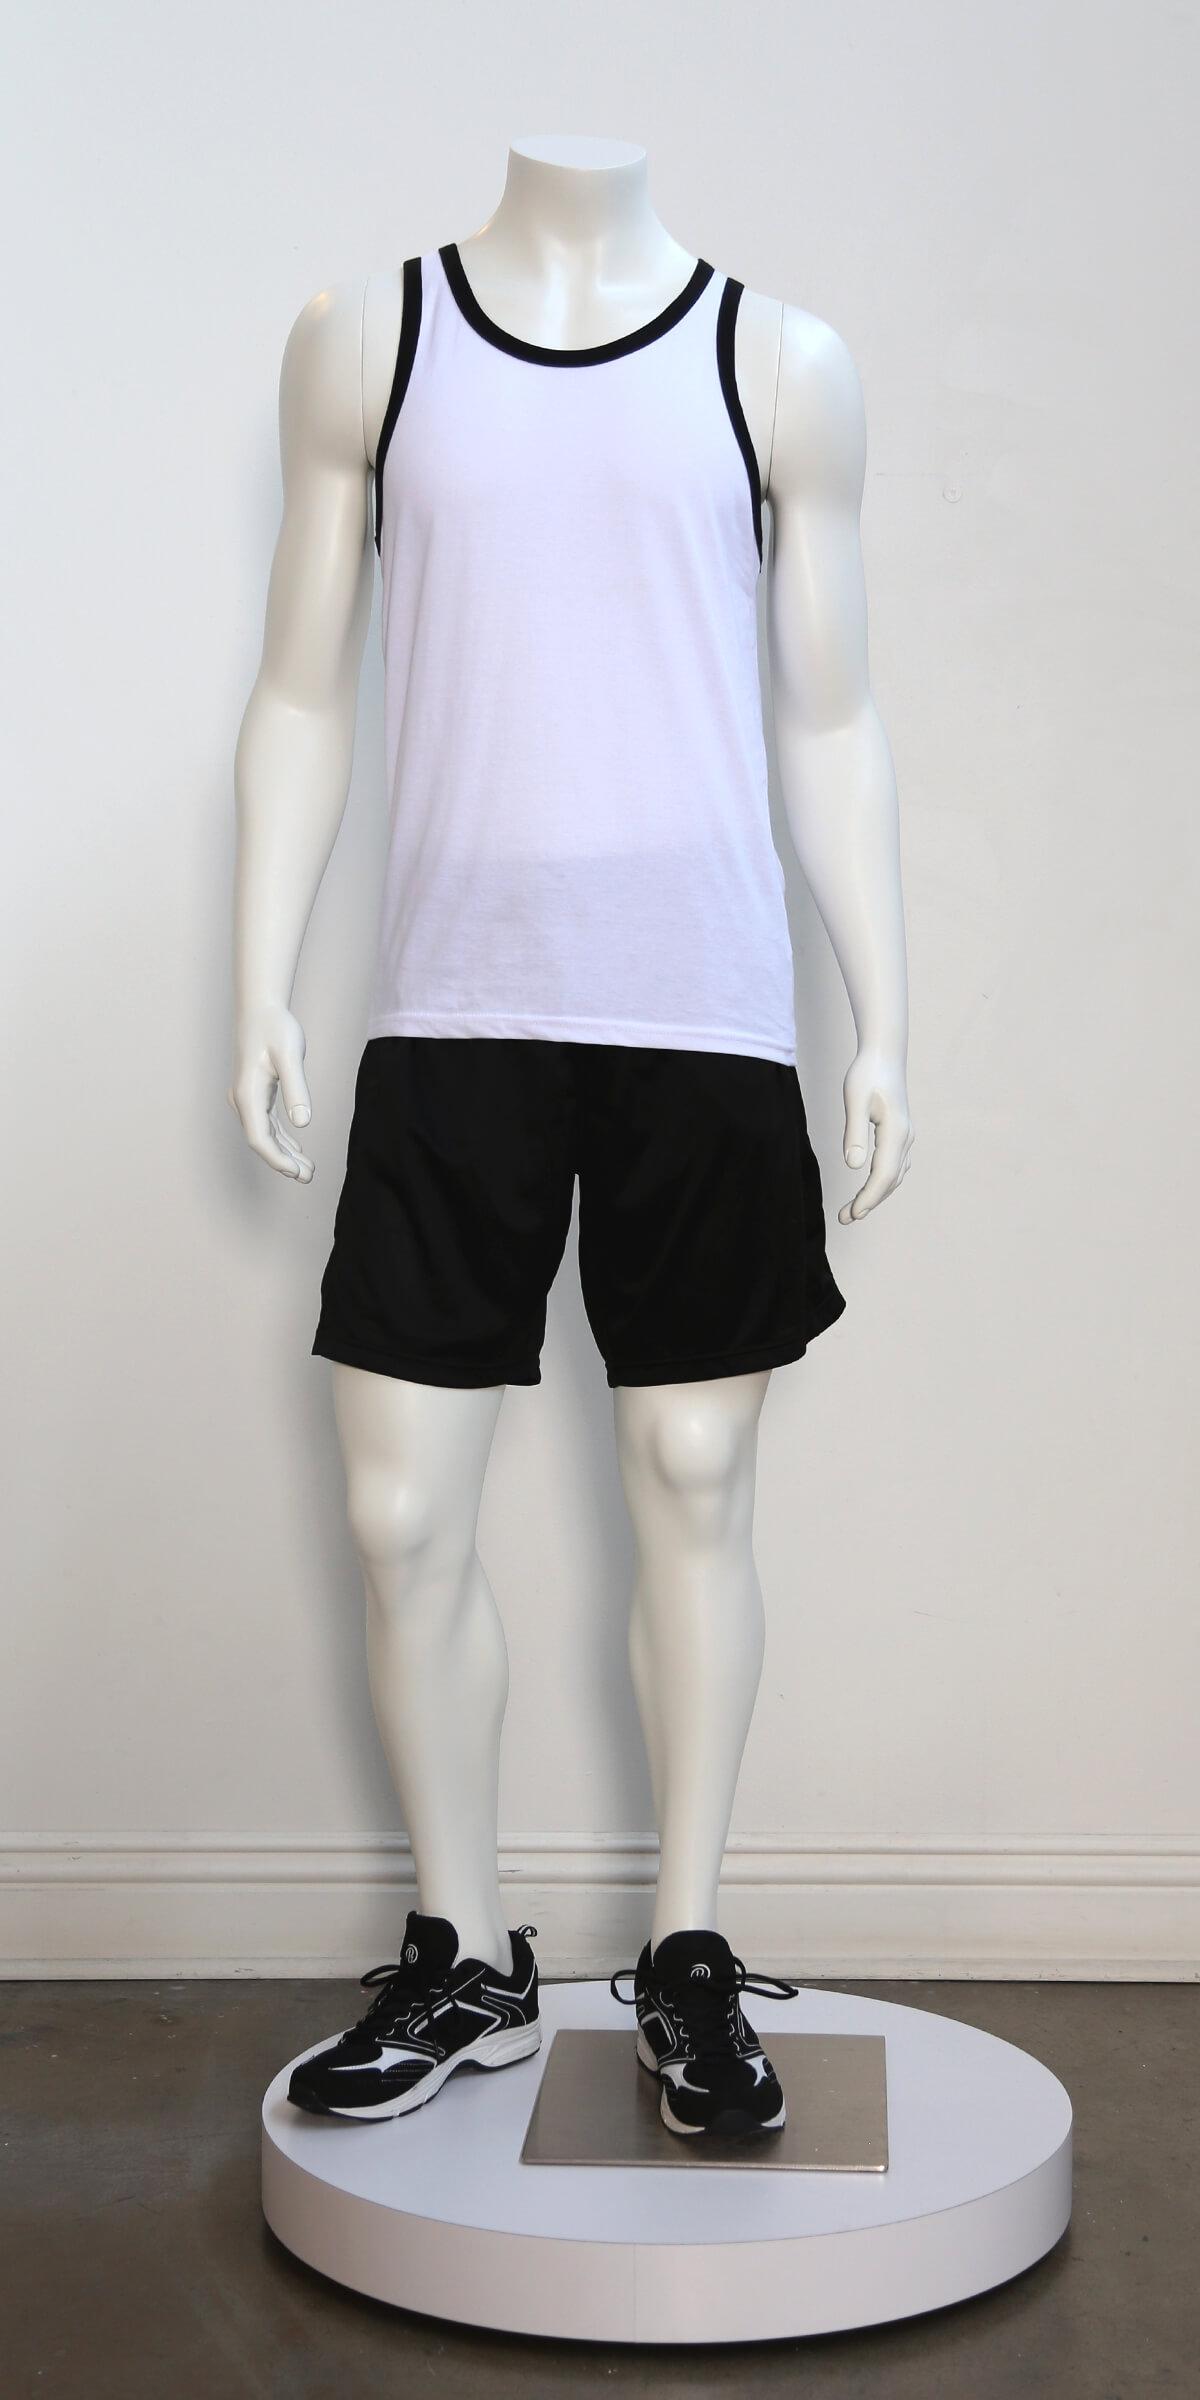 FIT2-M1-Dressed